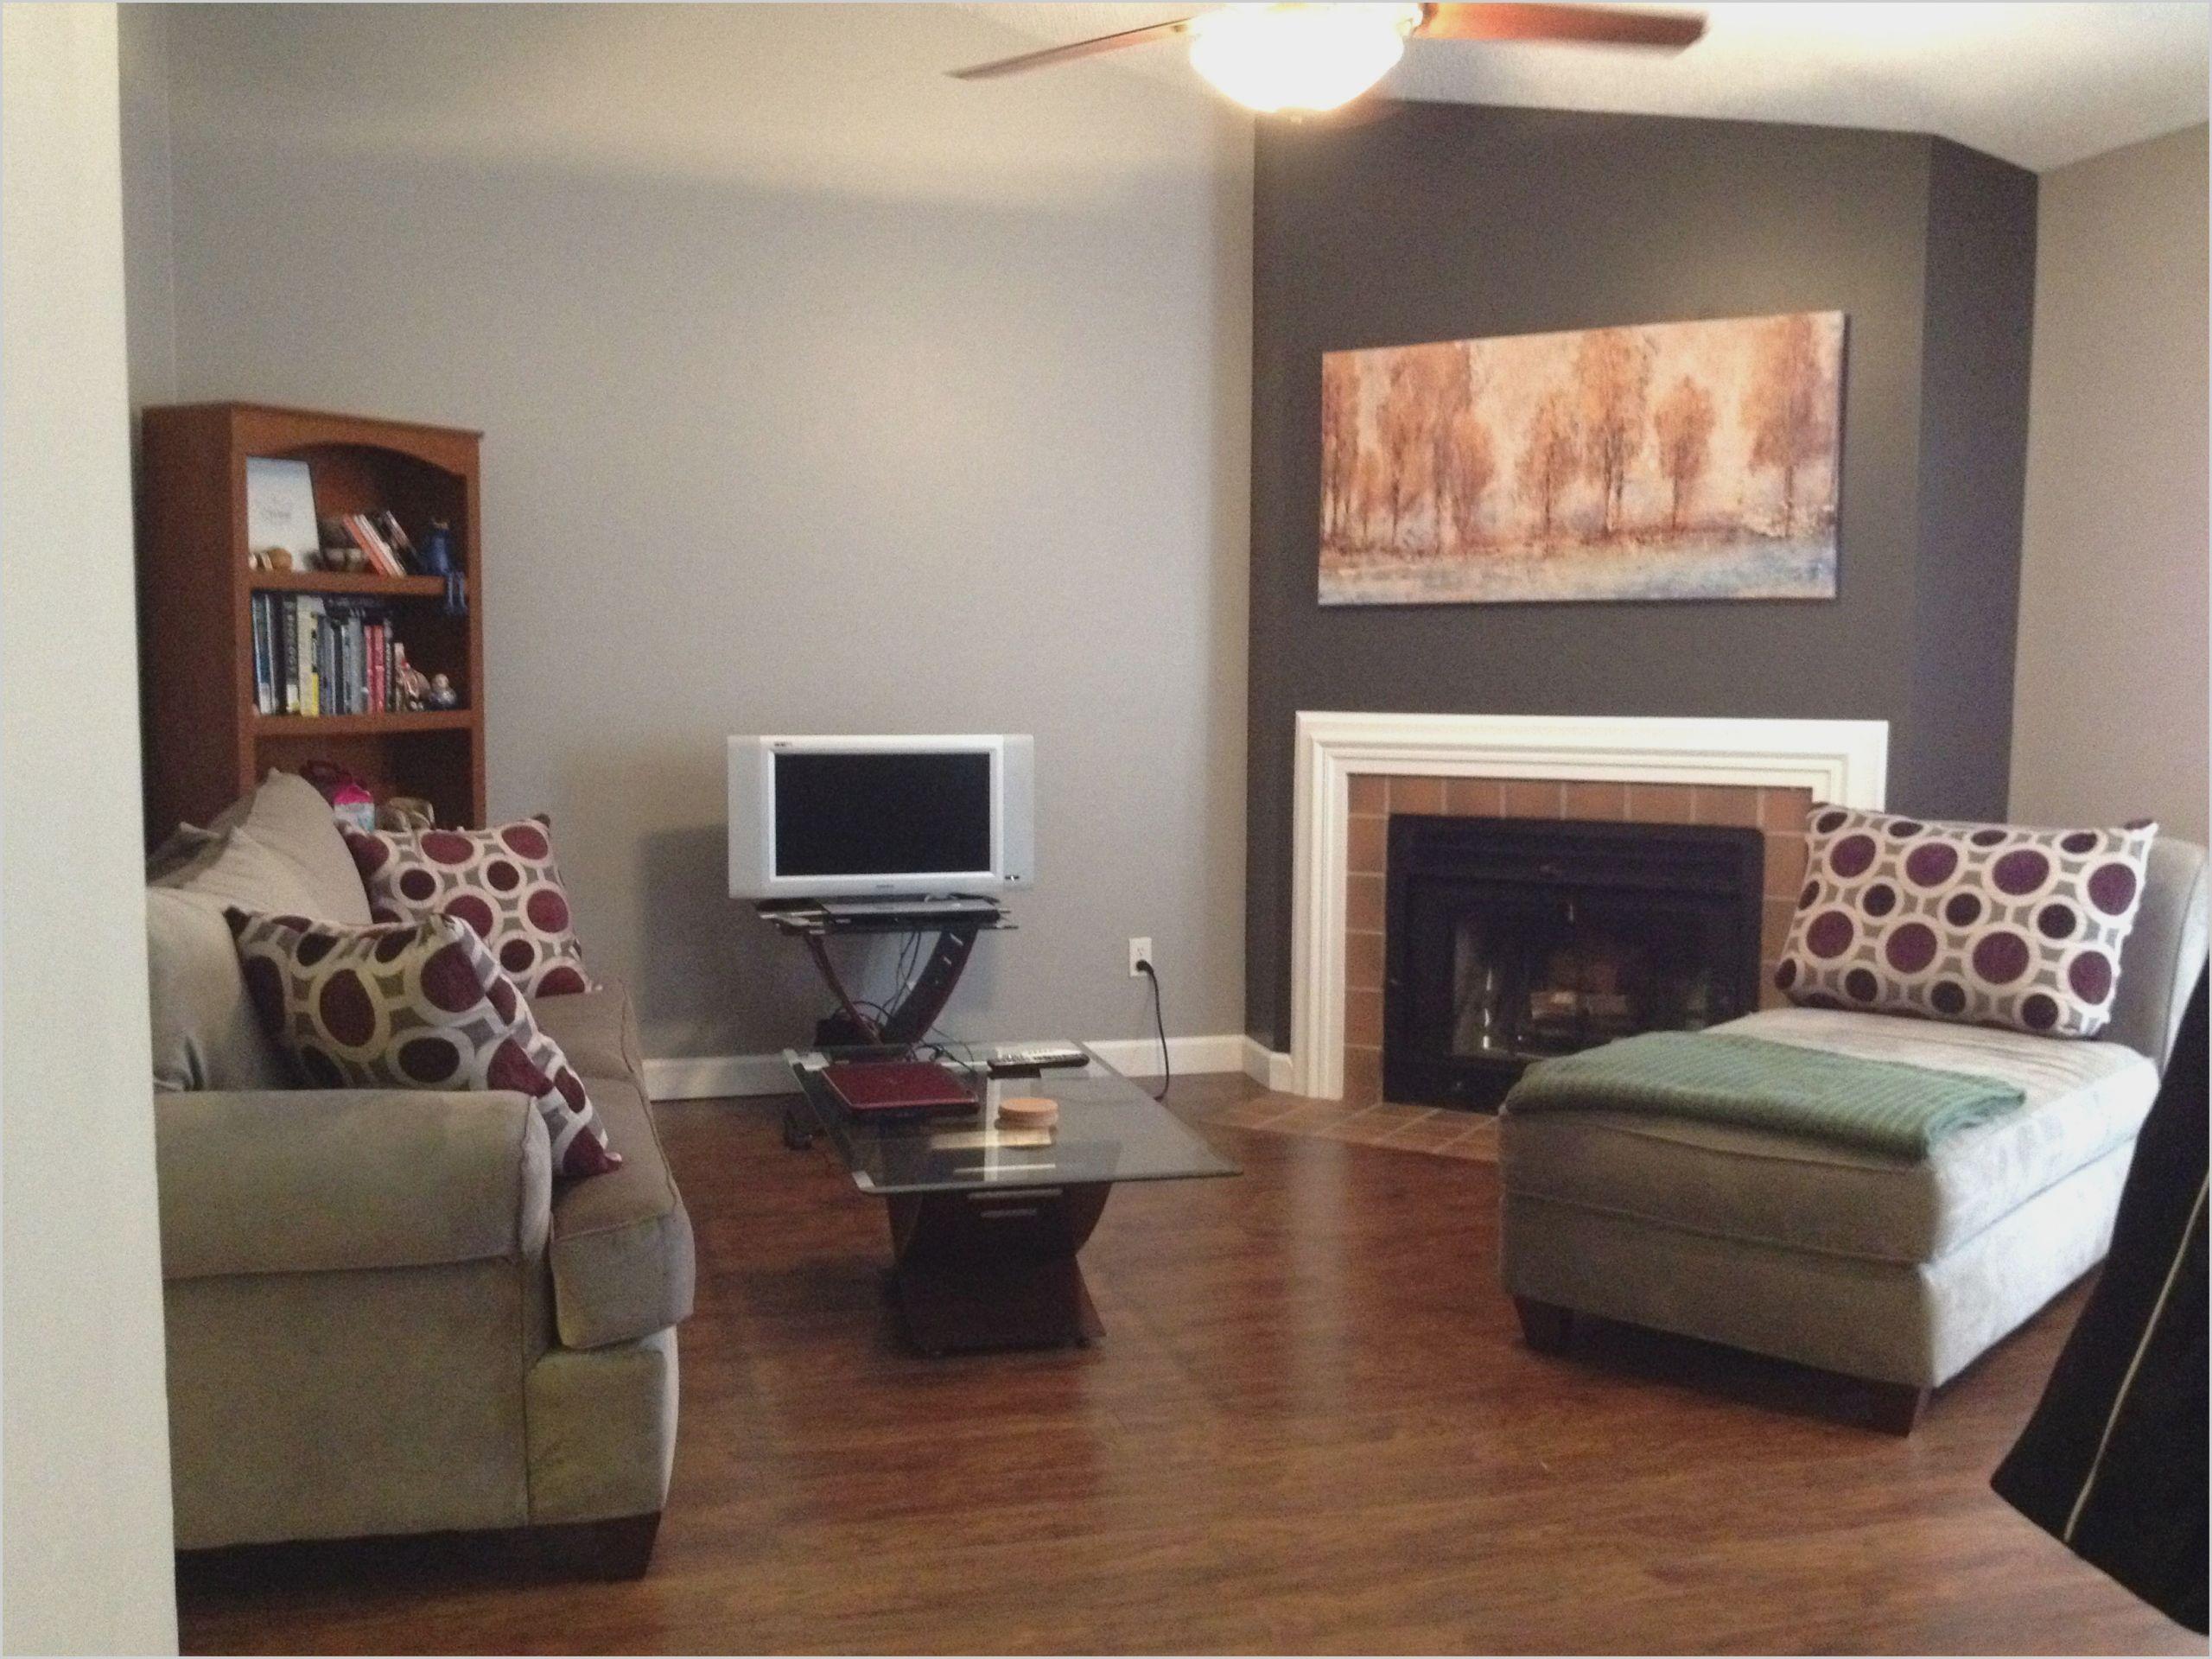 Modern Grey Paint Living Room Greige Living Room Living Room Paint Grey Paint Living Room Home decorating ideas living room paint